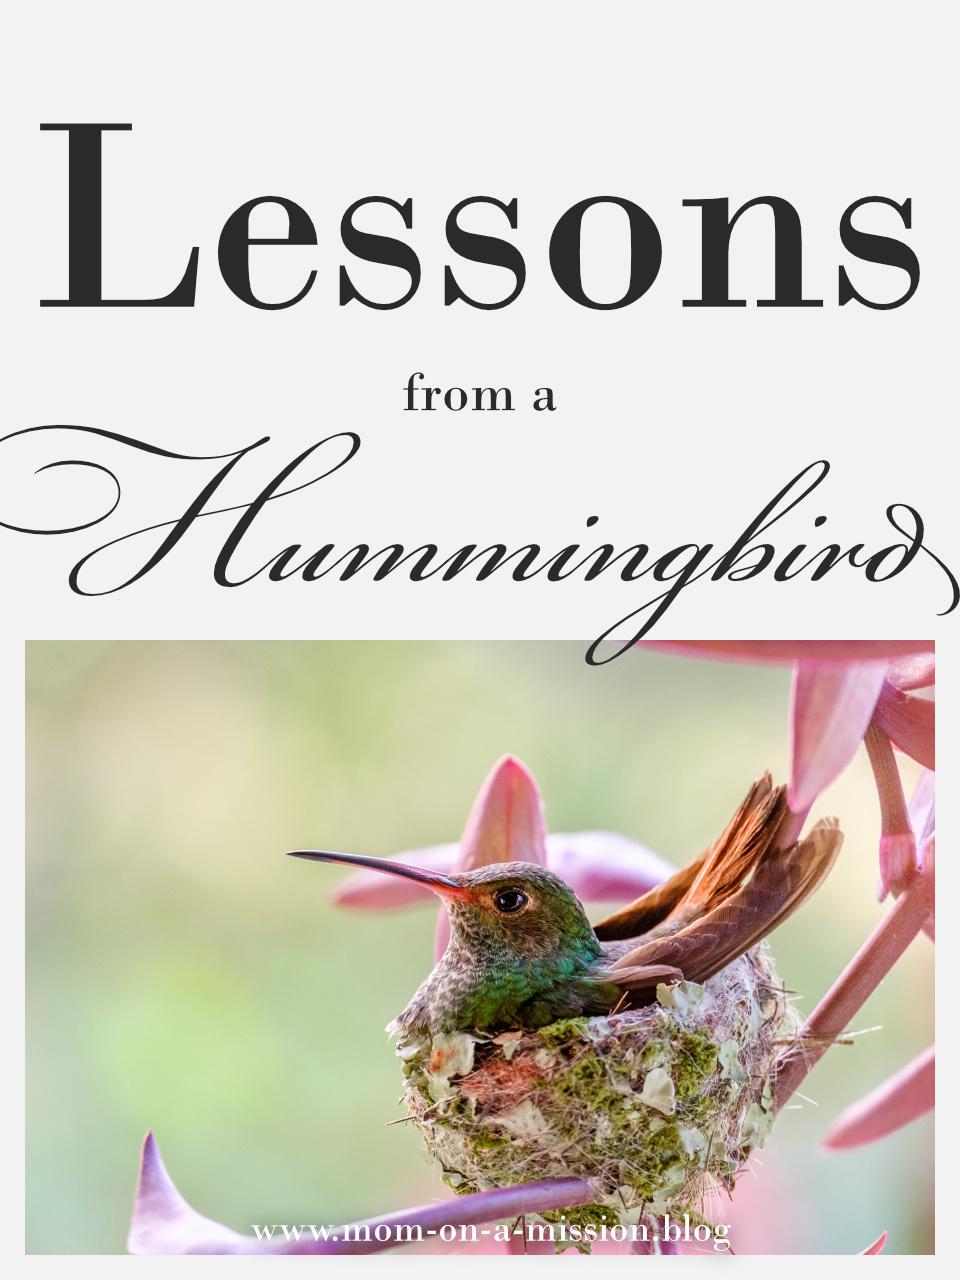 Lessons from a Hummingbird  #momonamissionblog #hummingbird #lifelessons